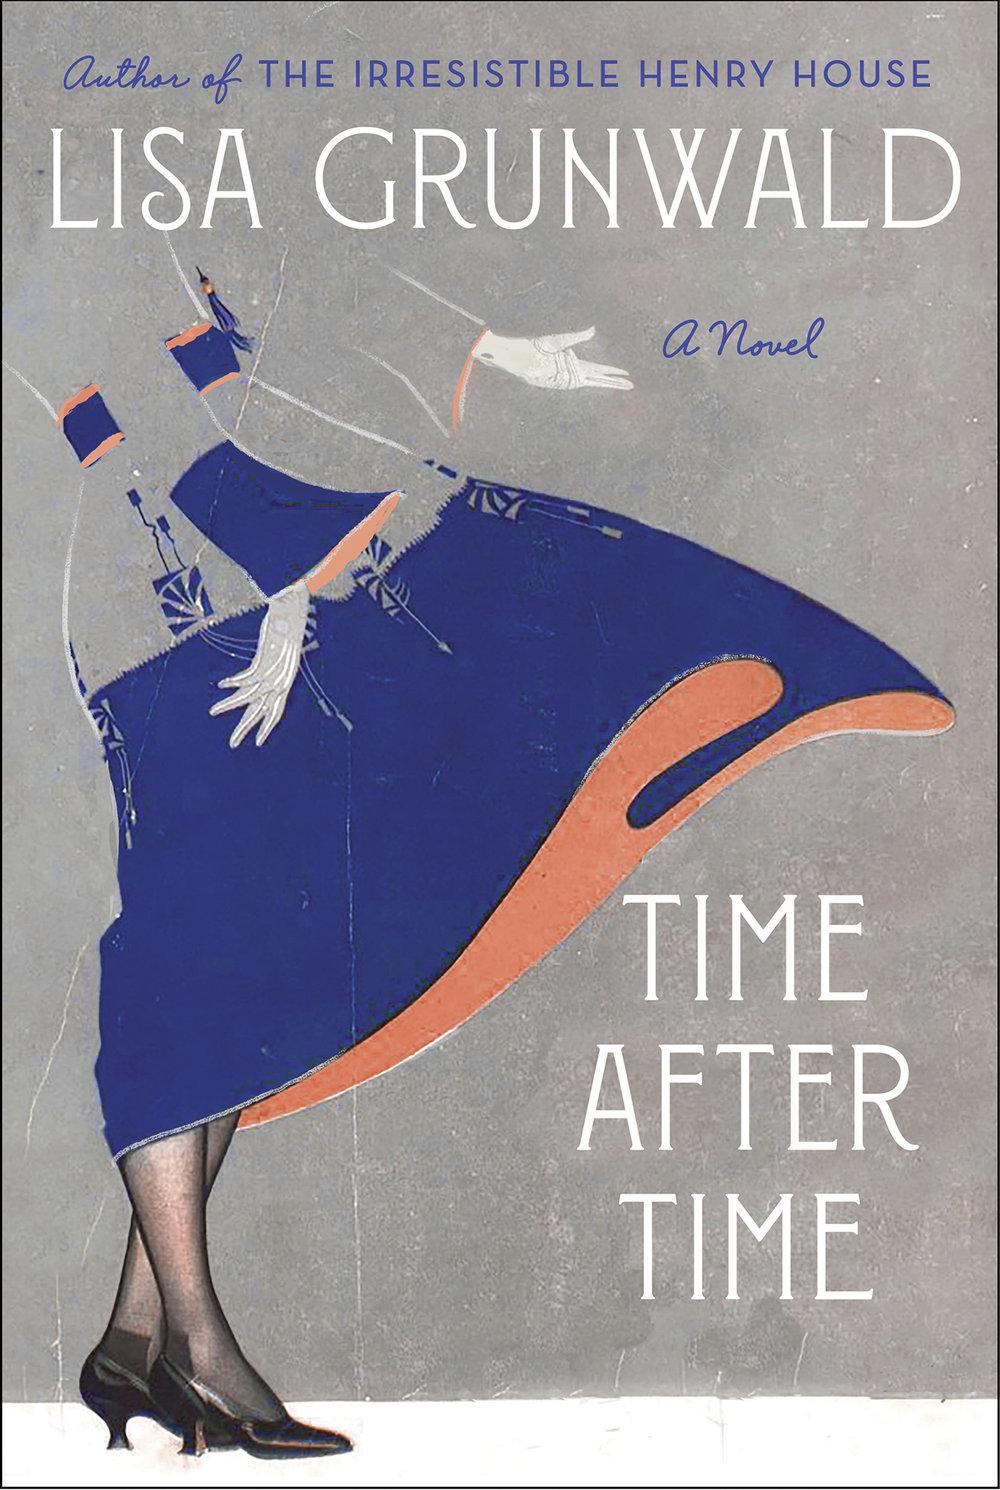 Time After Time  by Lisa Grunwald  Random House —- June 18, 2019